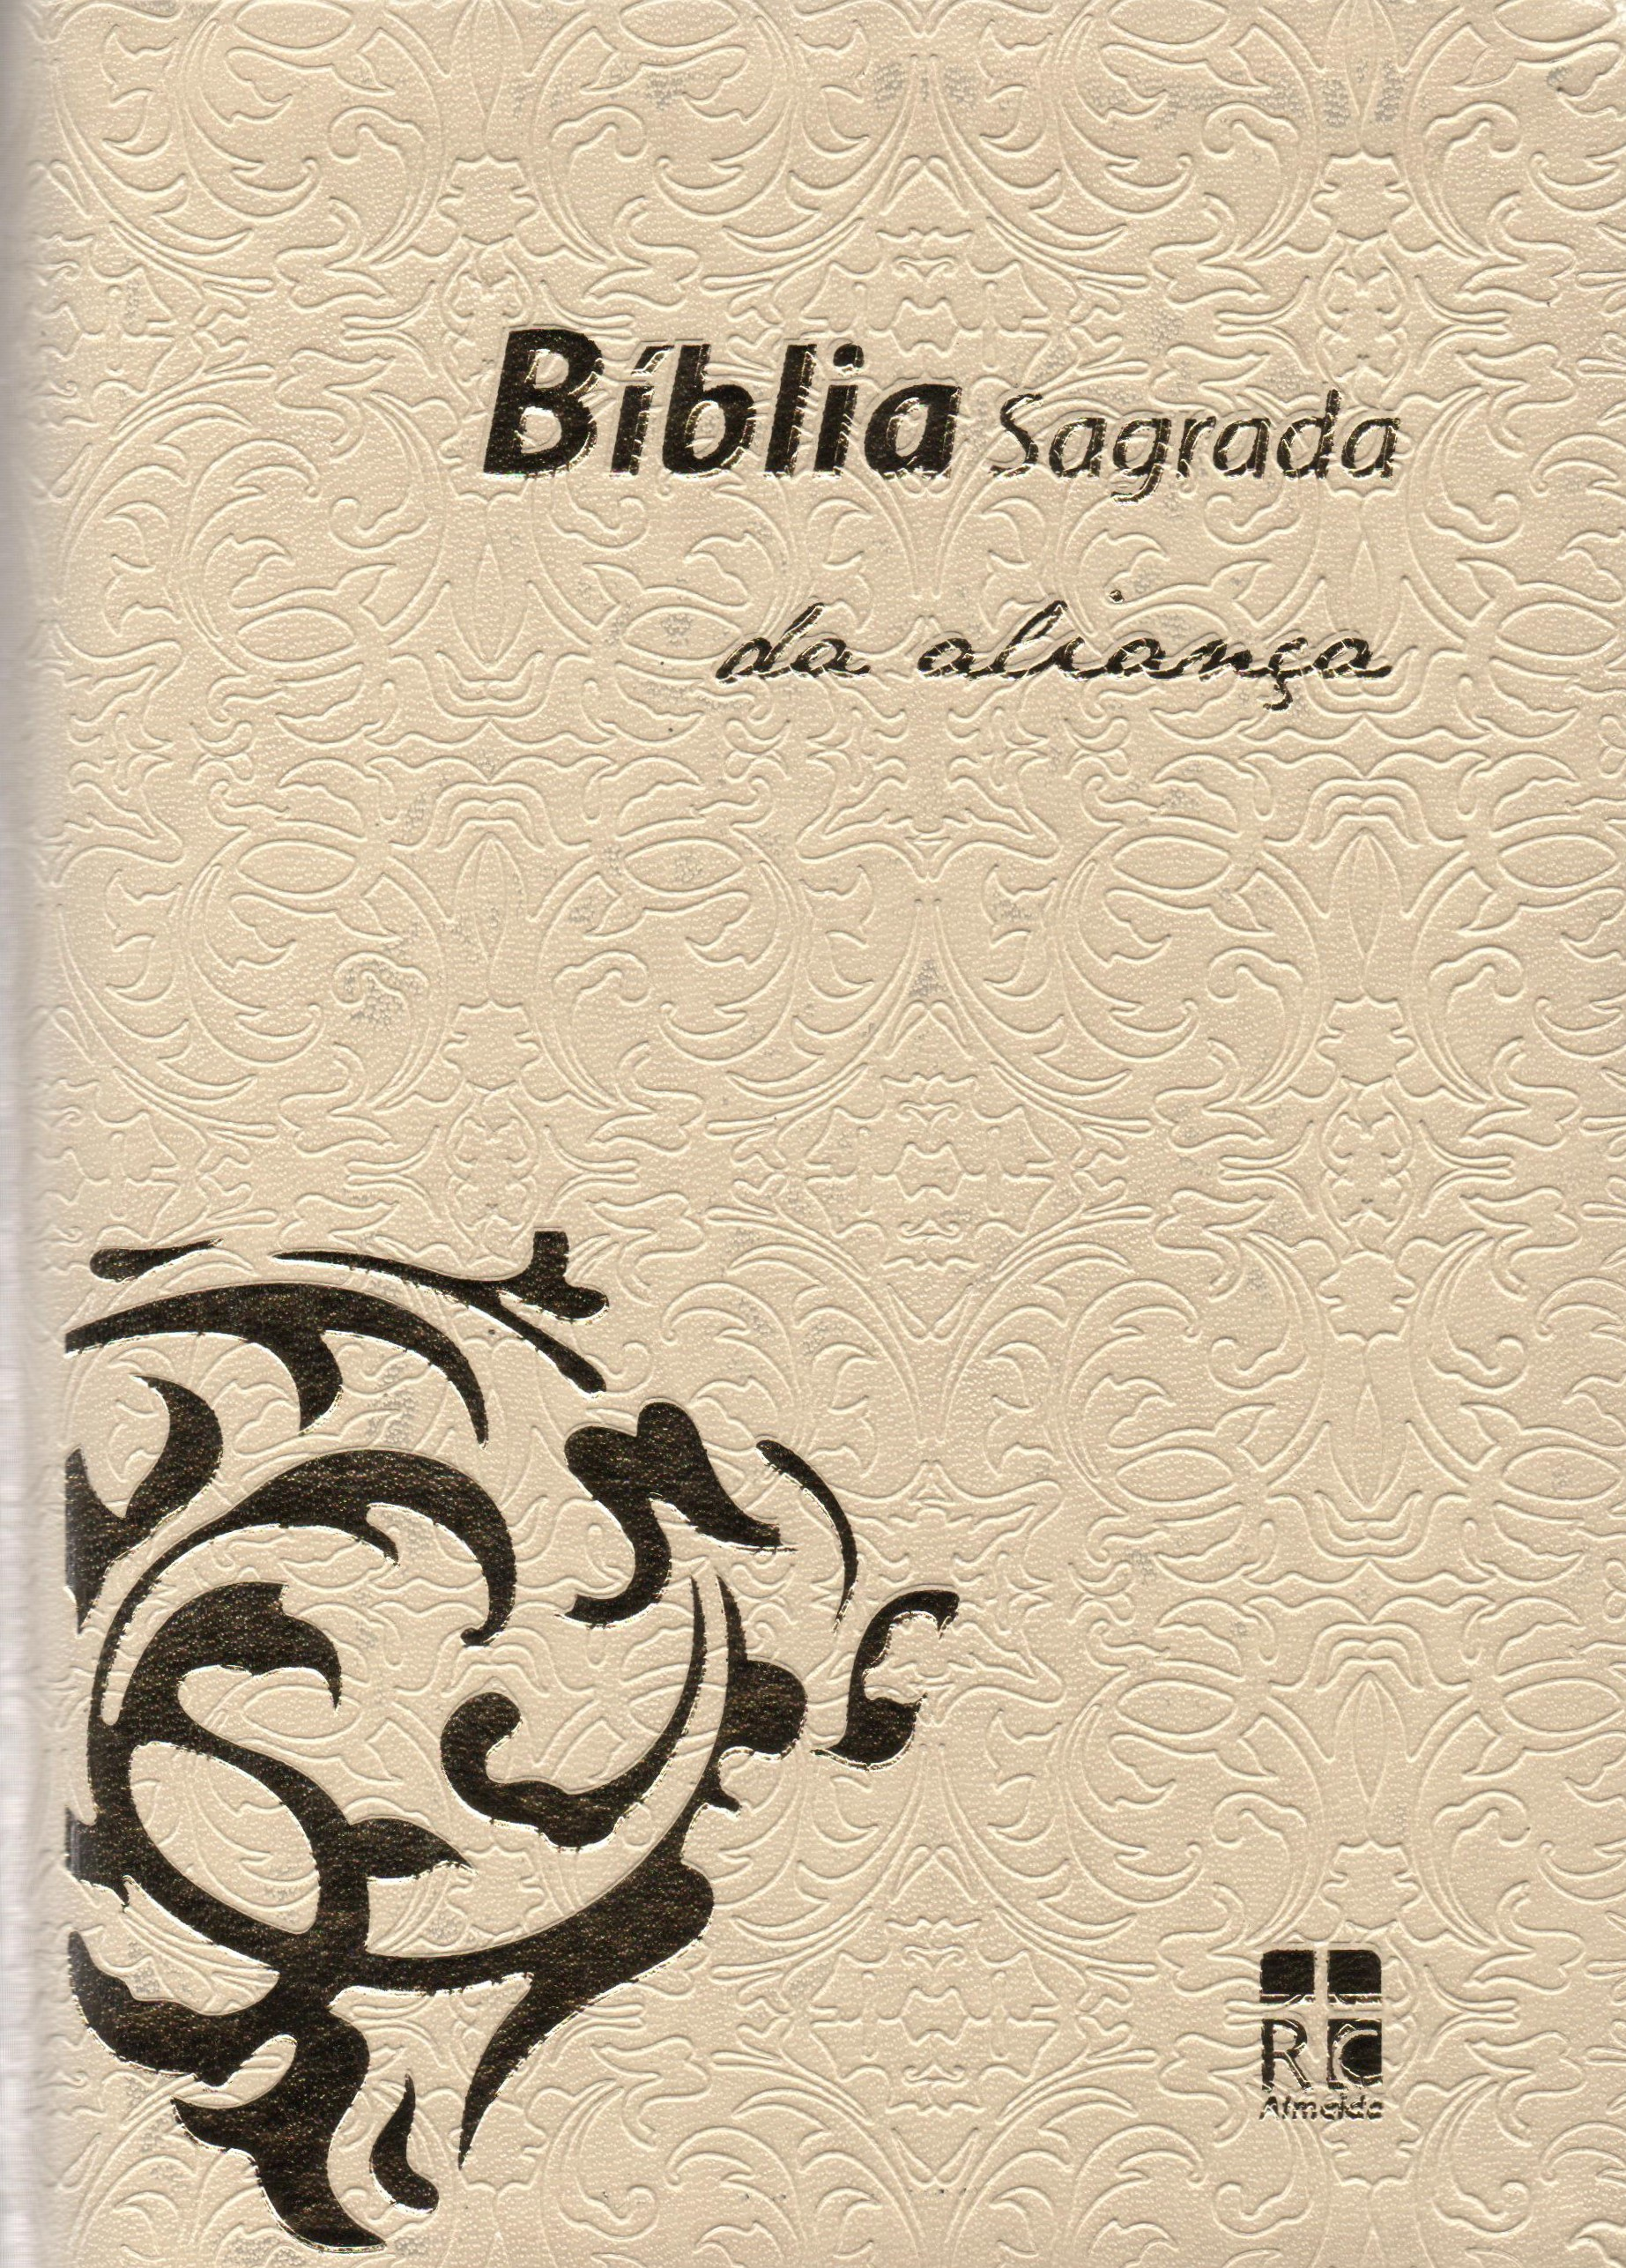 Bíblia da aliança